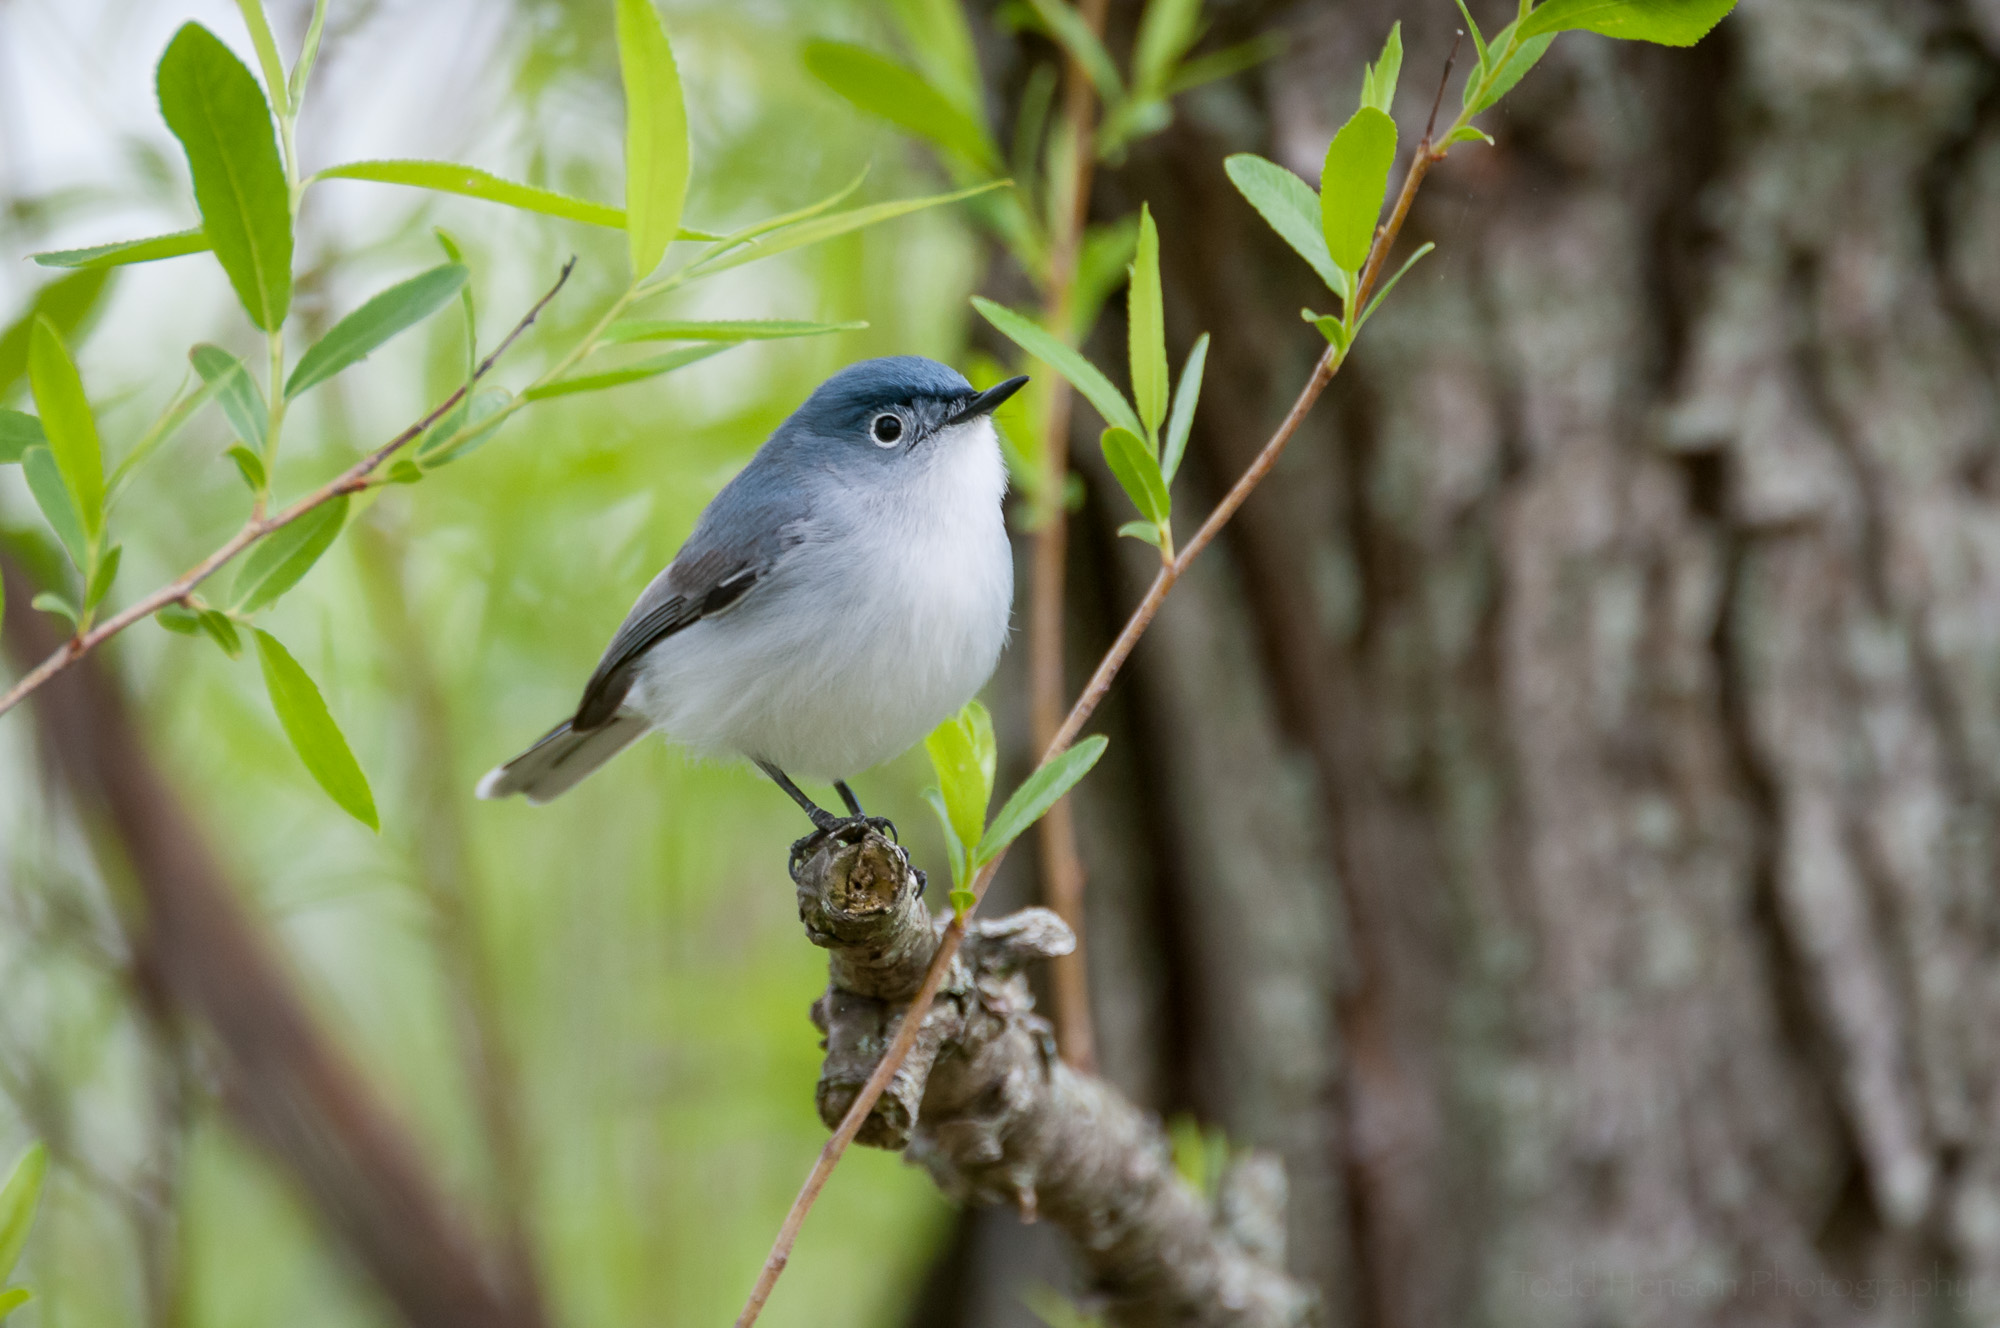 Male Blue-Gray Gnatcatcher sitting on a branch